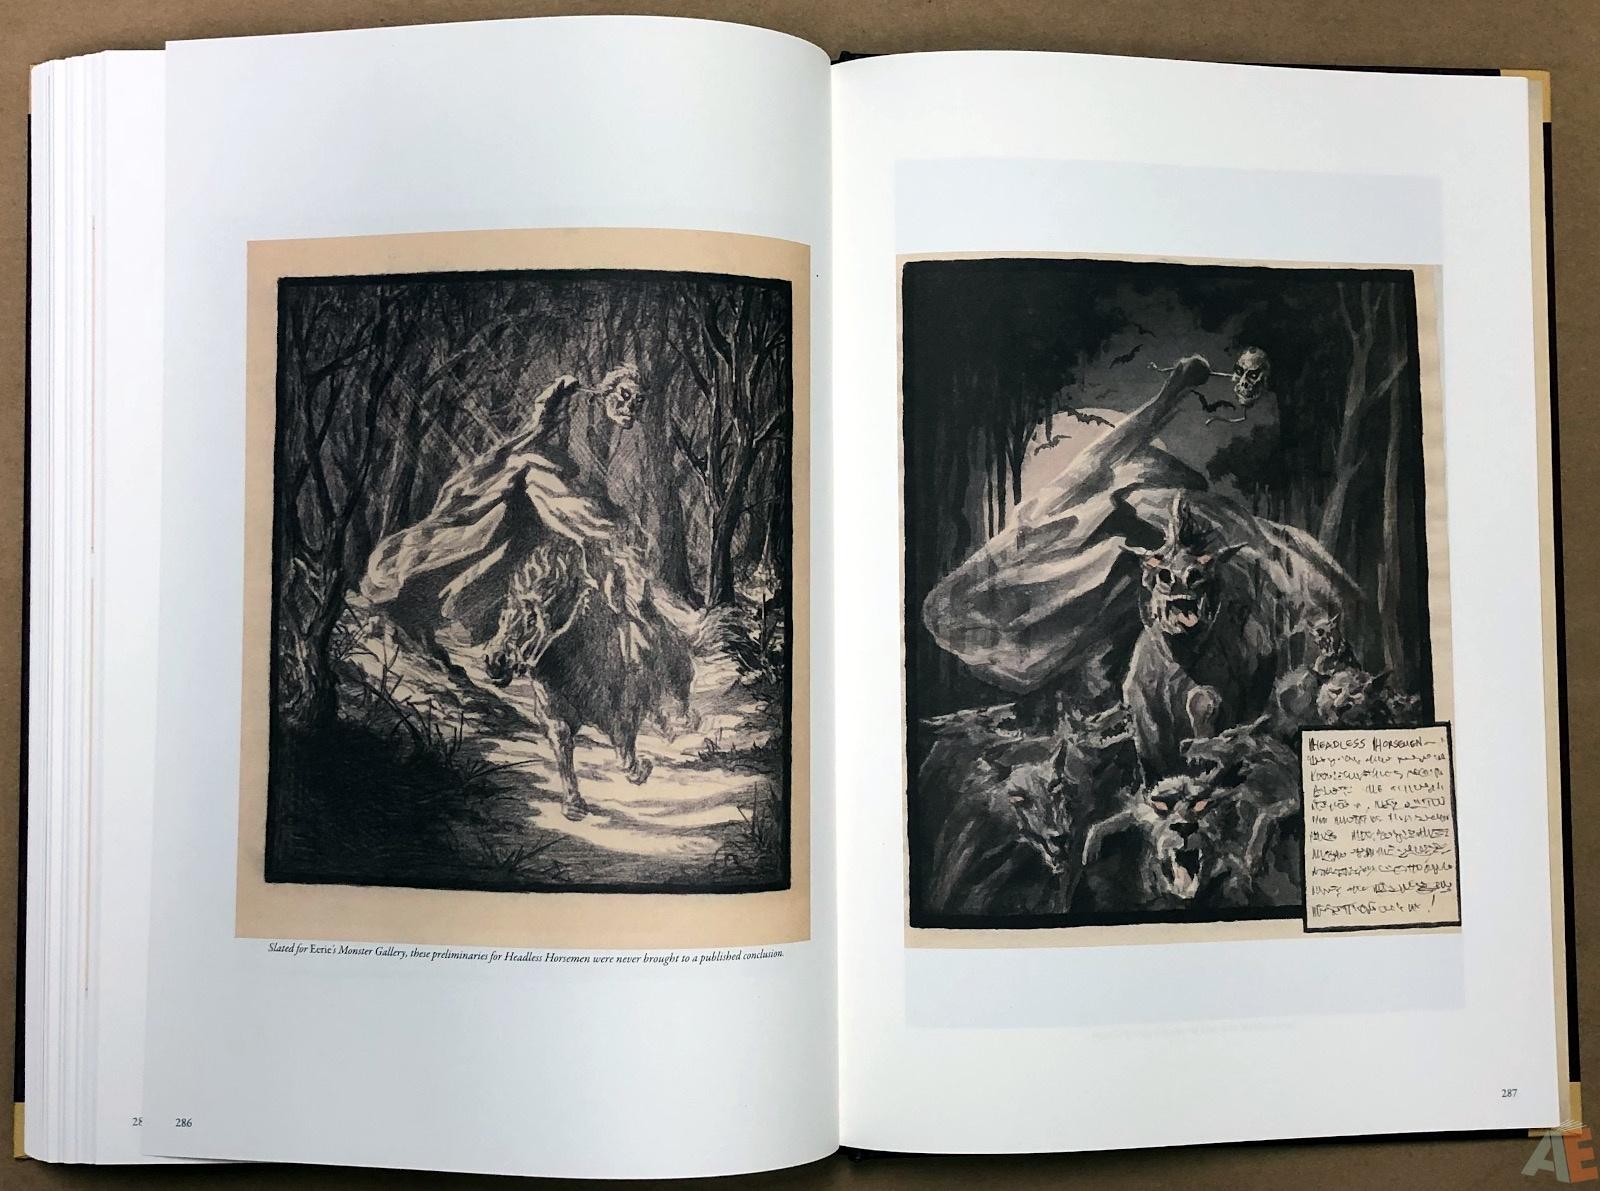 Roy G. Krenkel: Father of Heroic Fantasy - A Centennial Celebration 55